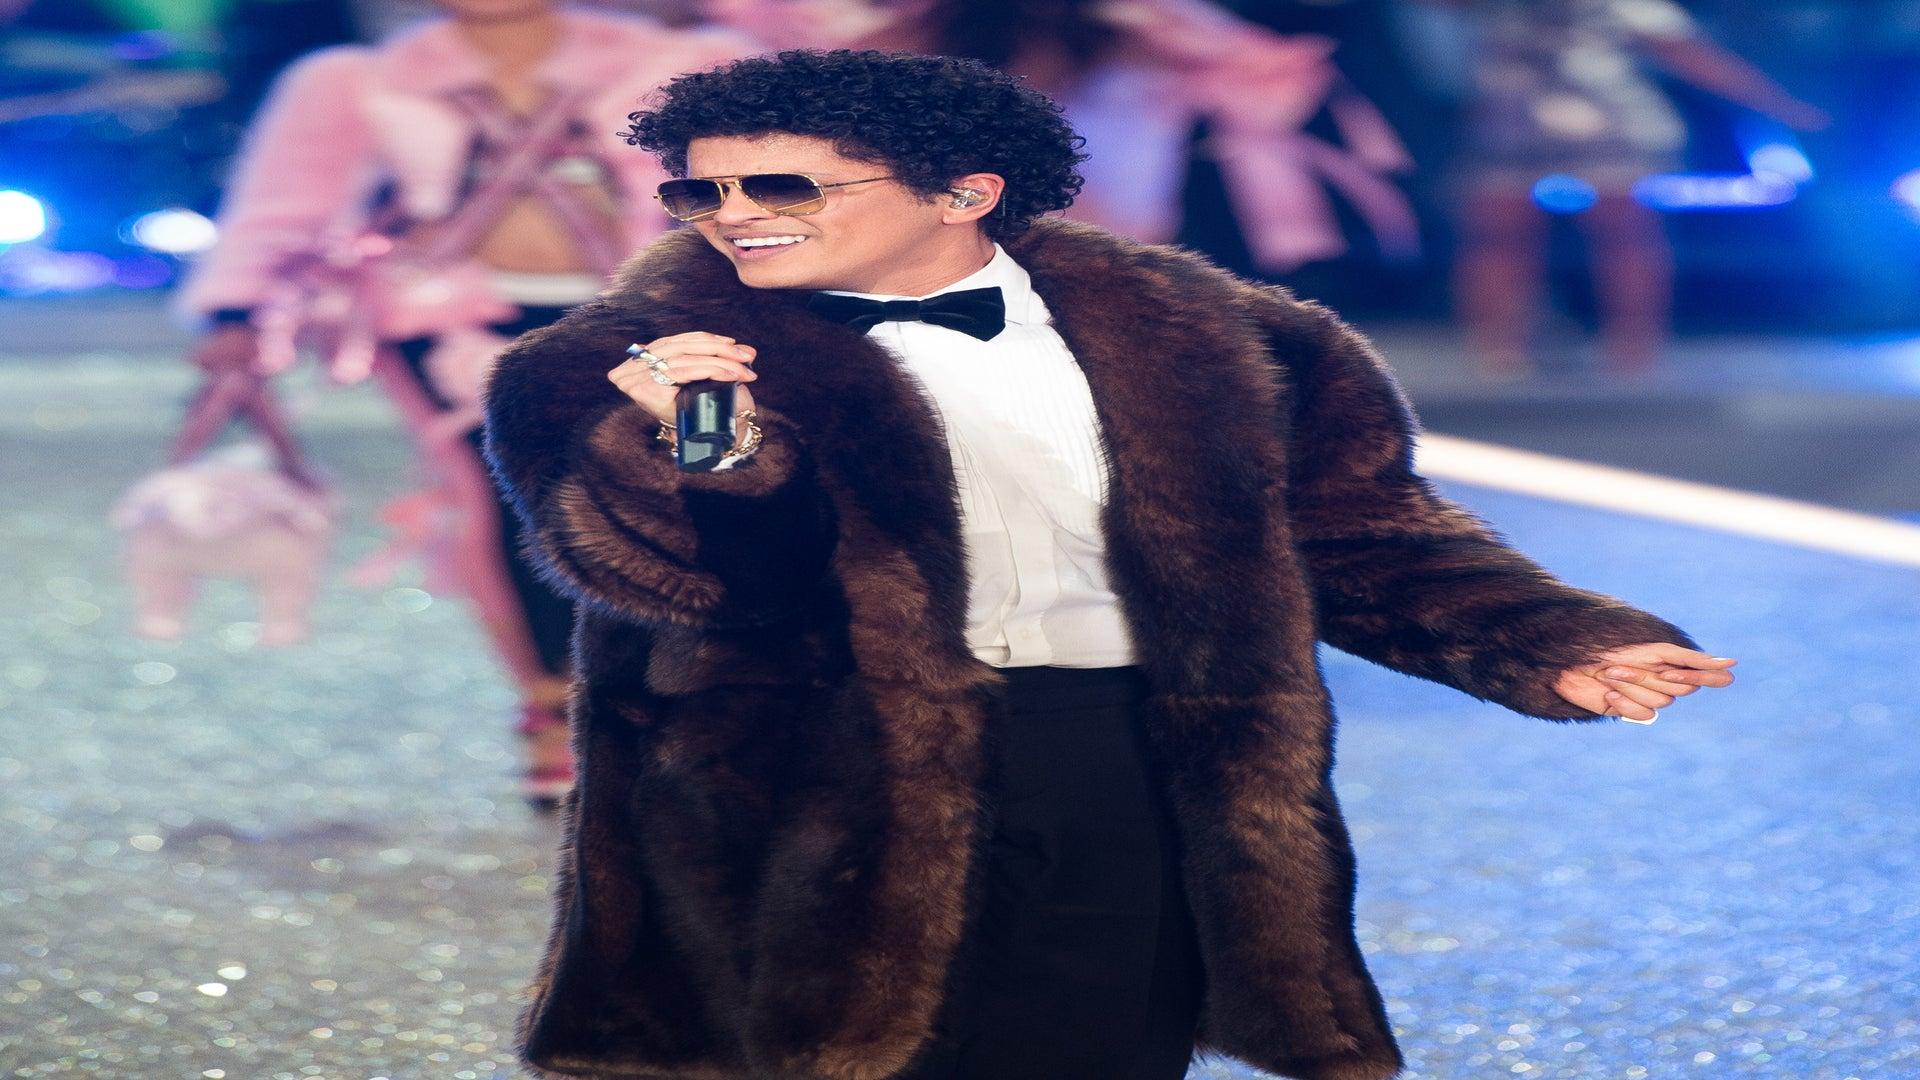 Bruno Mars Donates $1 Million To Flint Water Crisis Victims